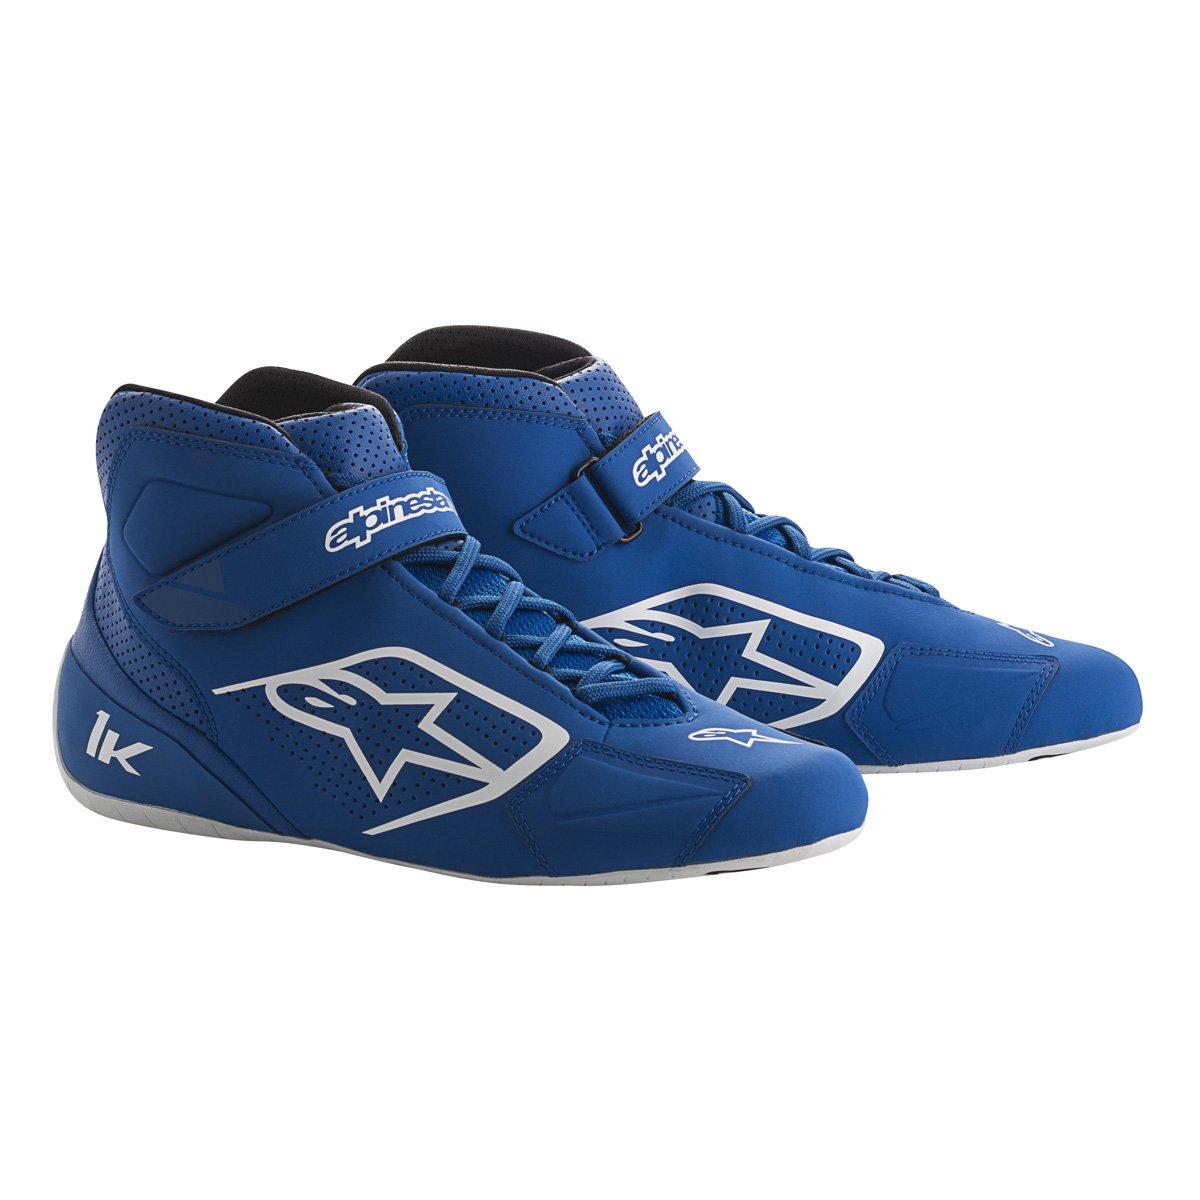 Alpinestars 2712018-1039-8.5 Tech 1-K Shoes Black//Fuchsia Size 8.5